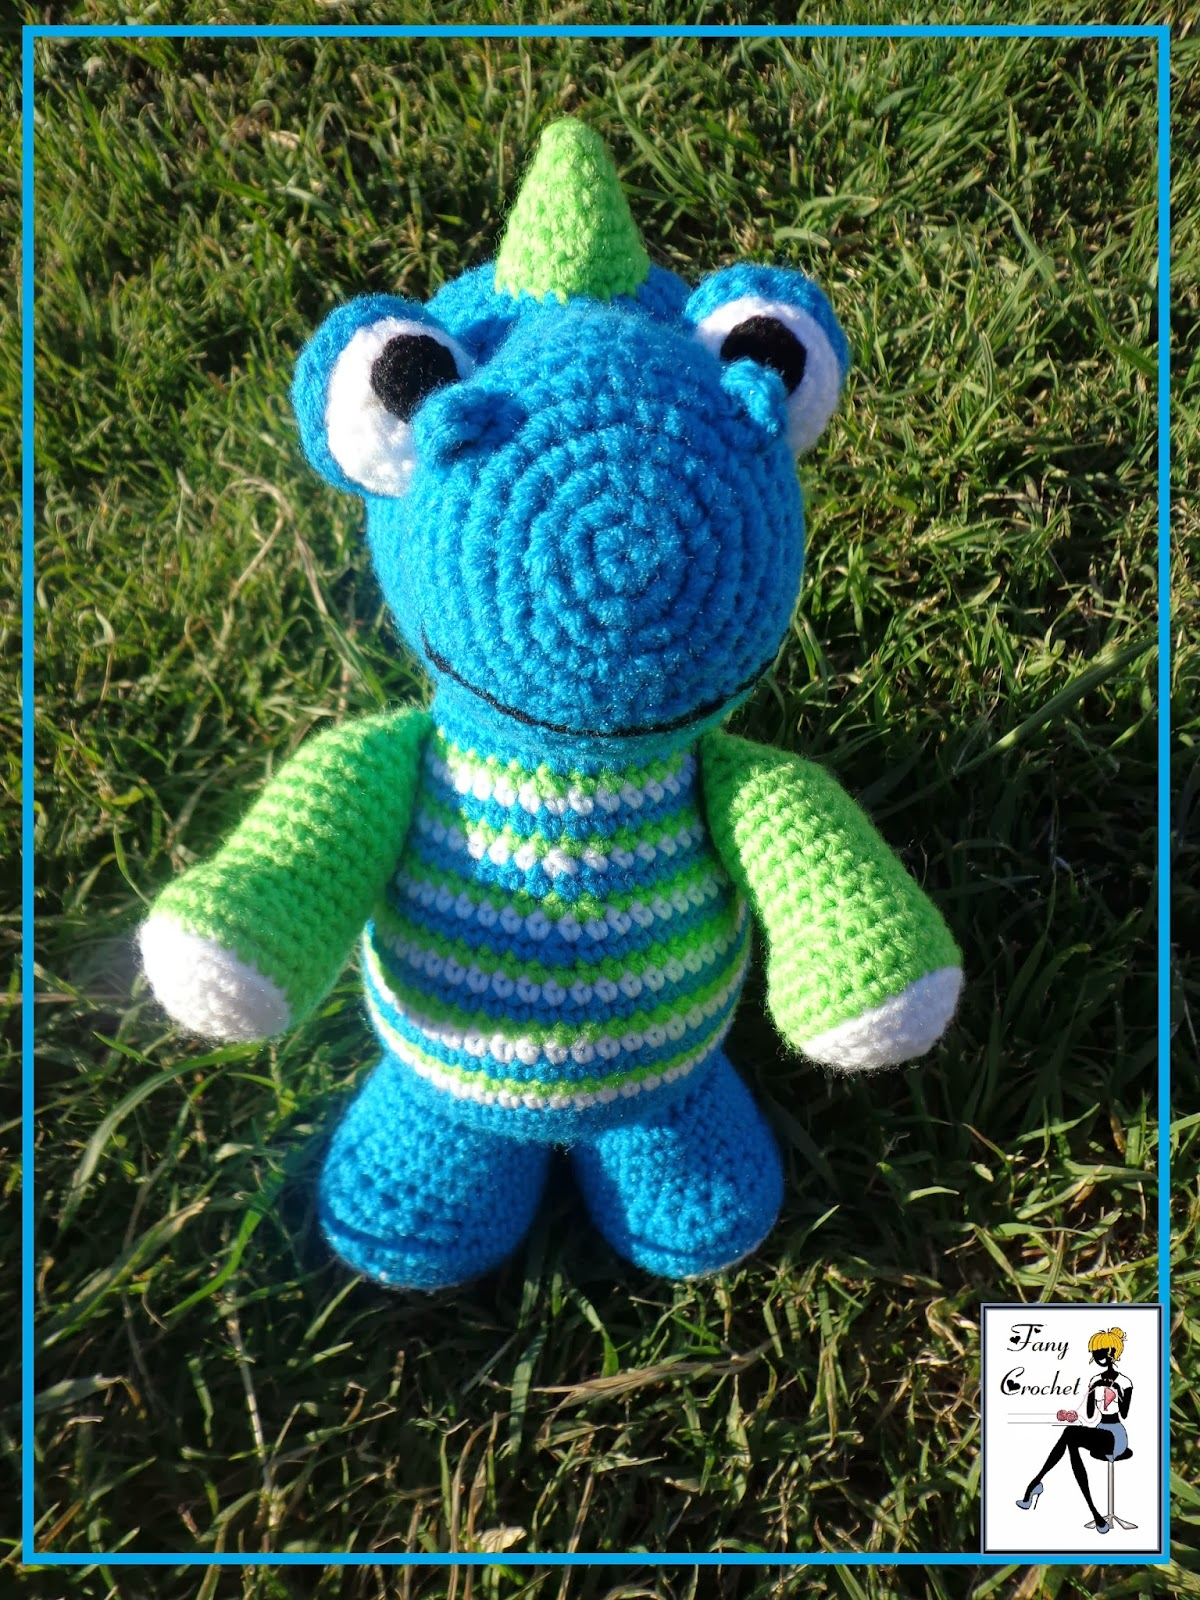 Fany Crochet: Dino Dino Colorido